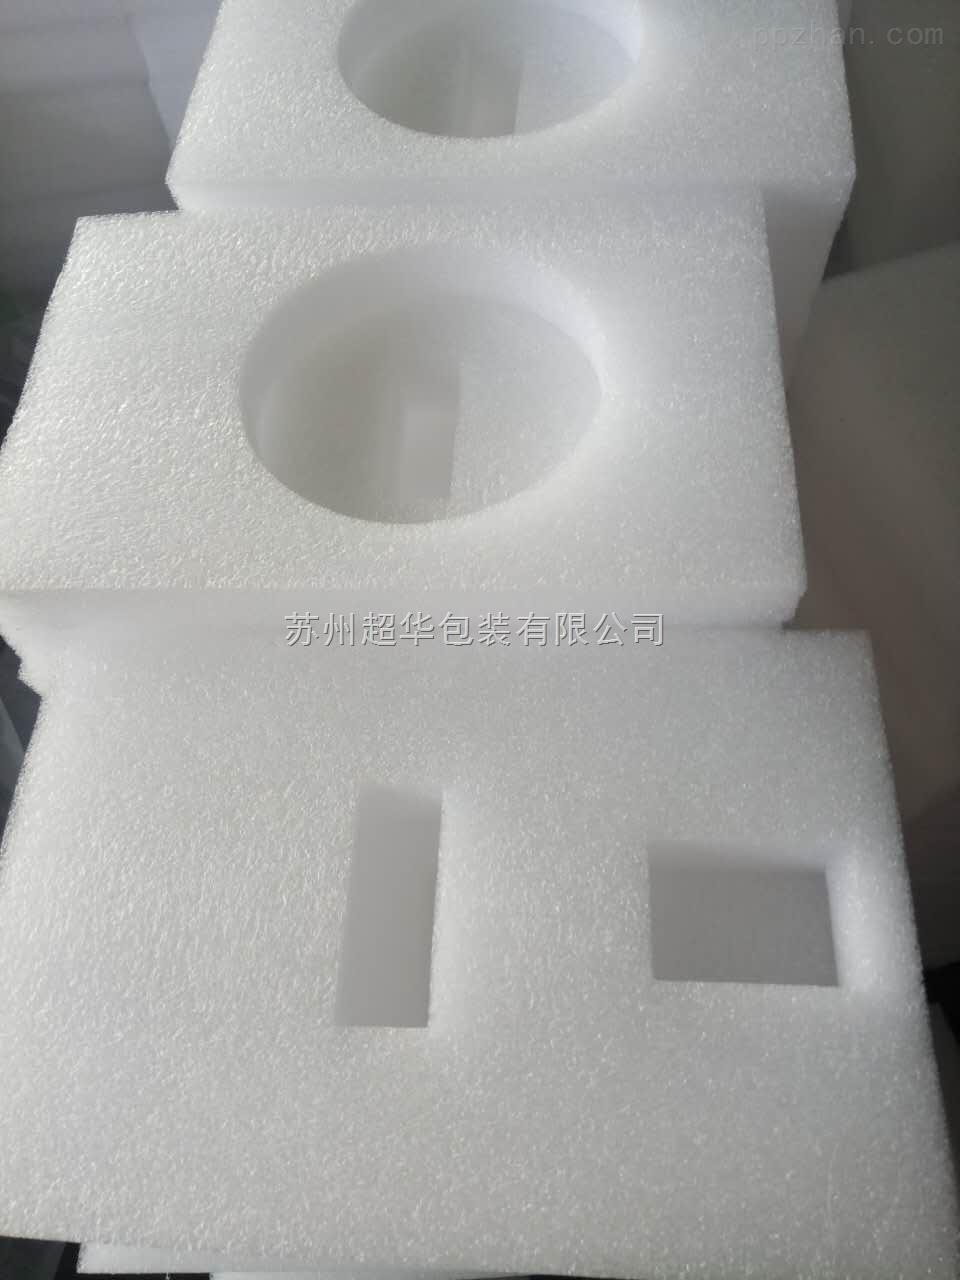 EPE珍珠棉包装盒 缓冲防震材料 厂家来样来图加工定制